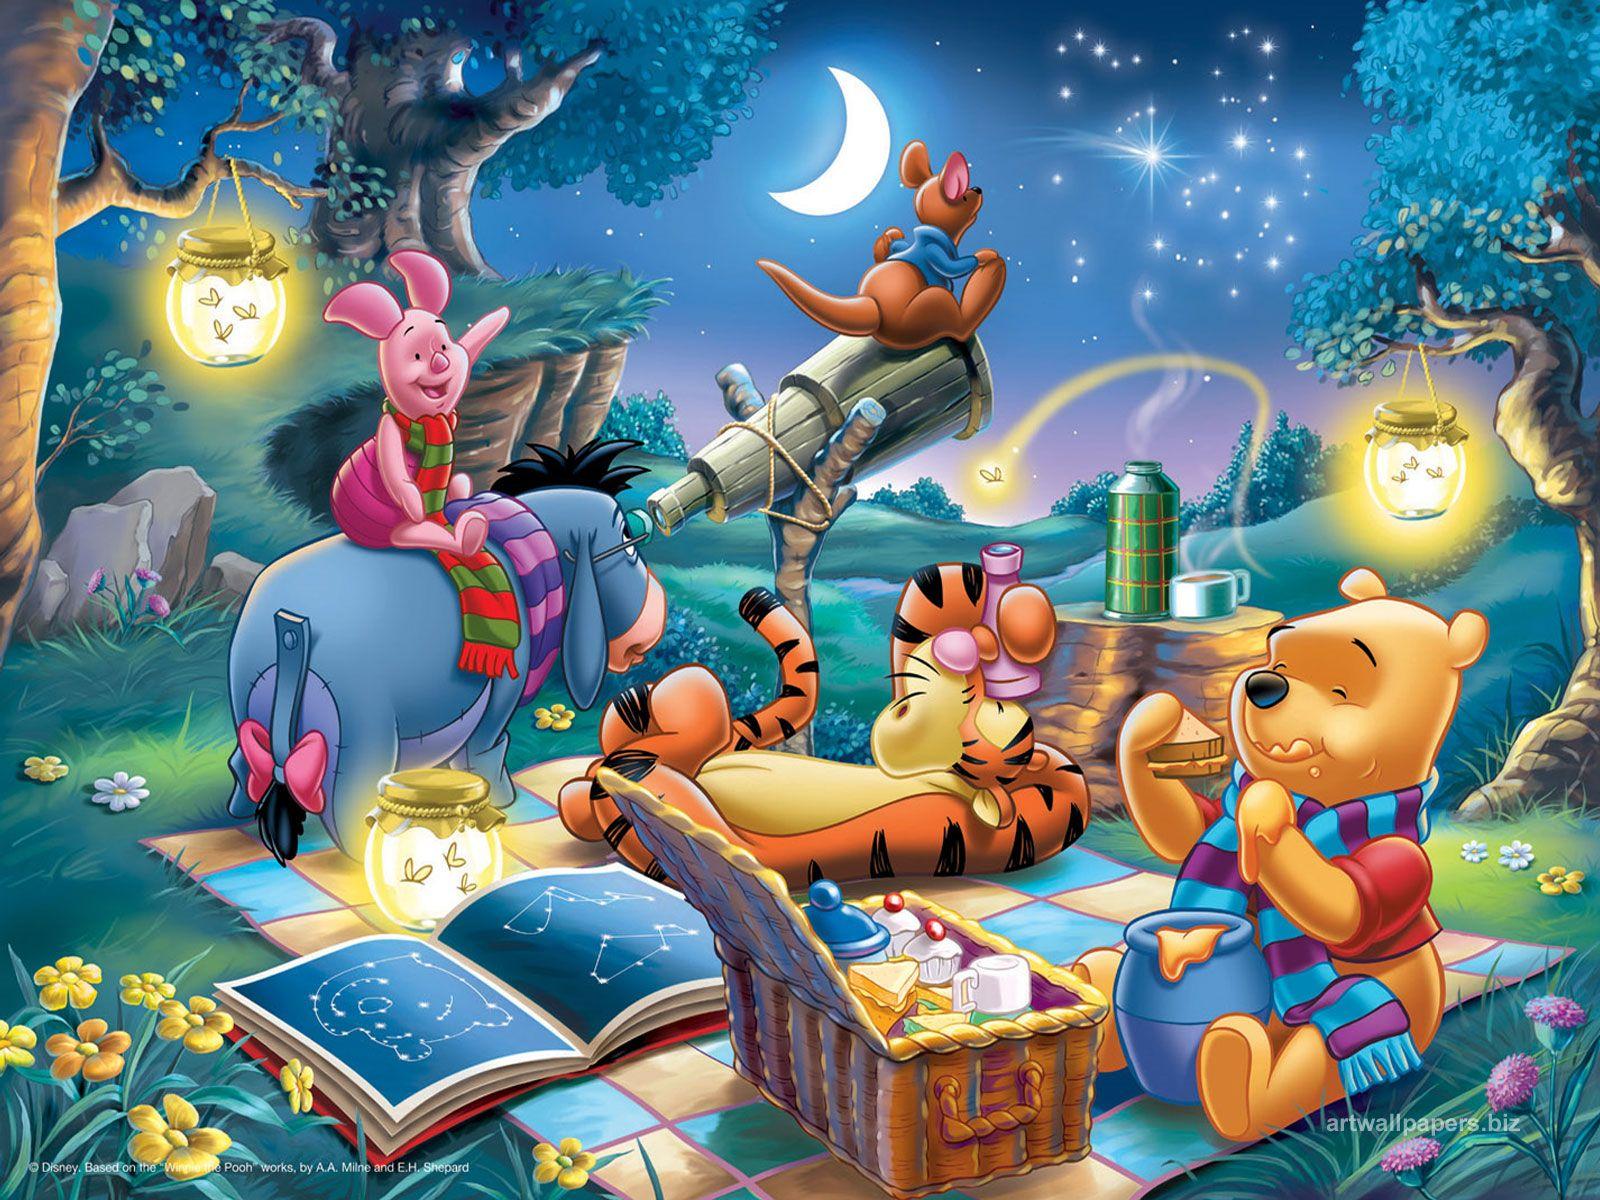 Real Fairy Tales Winnie The Pooh Winnie The Pooh Friends Happy Cartoon